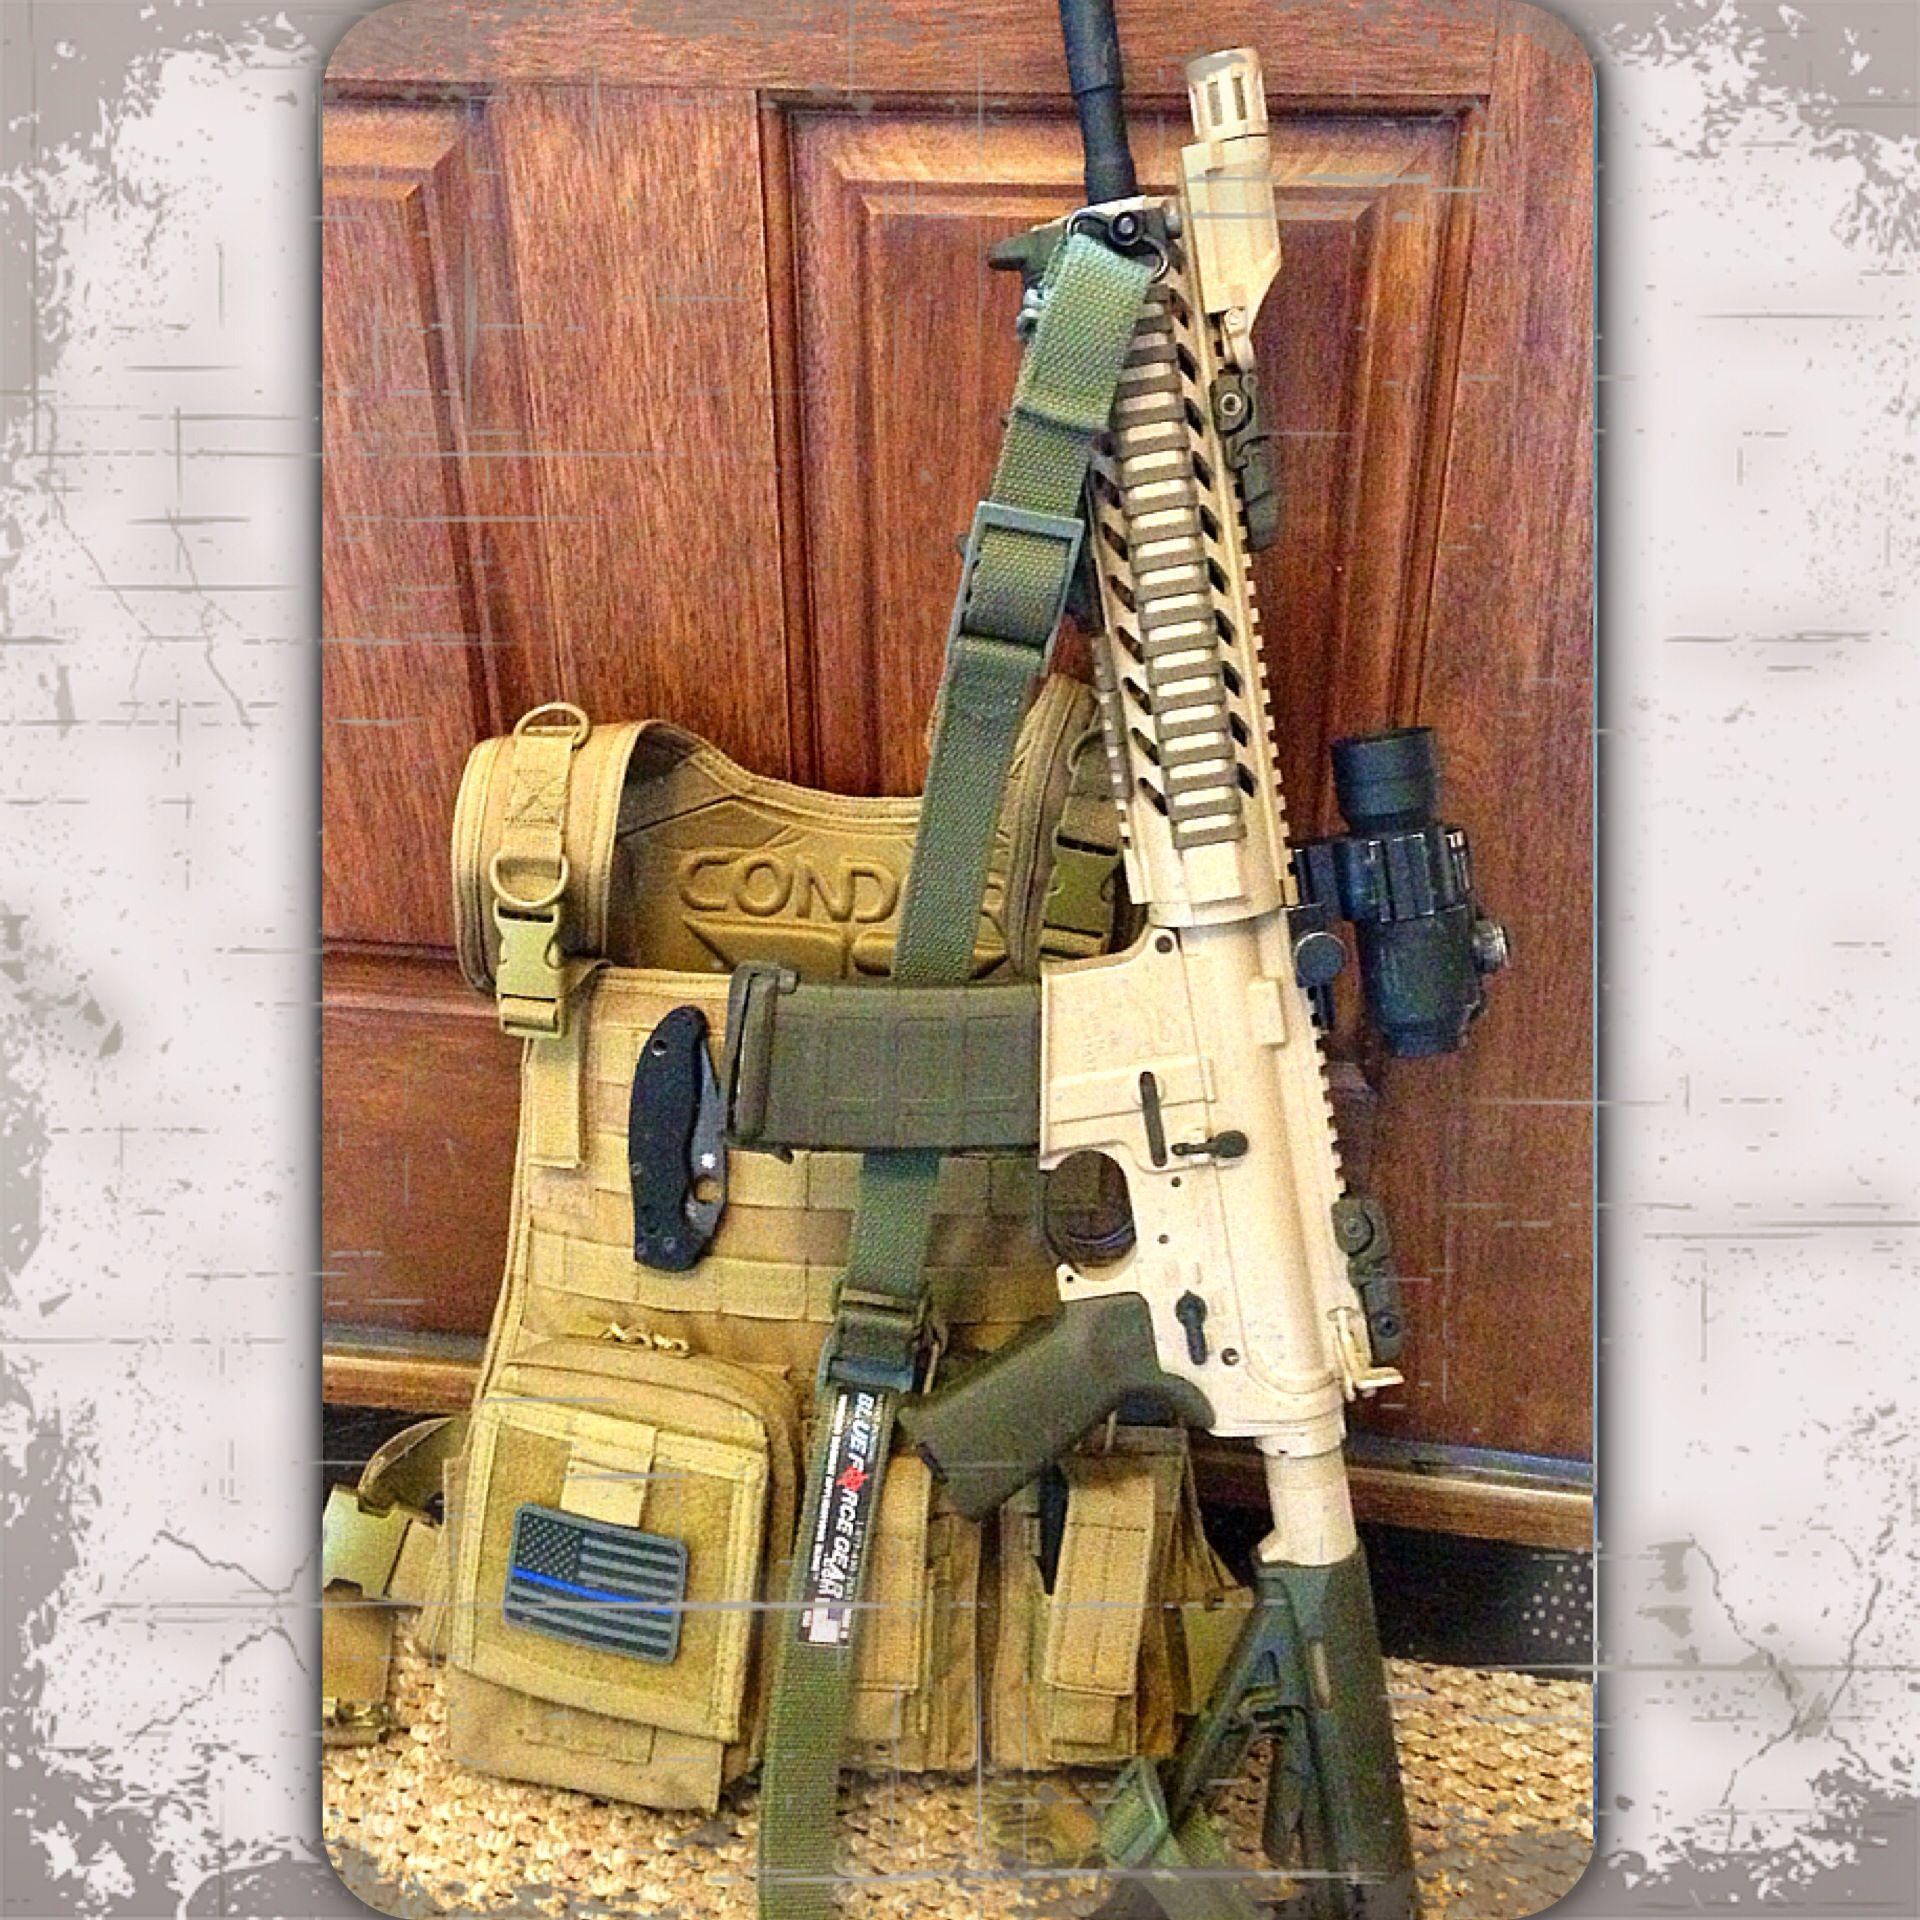 Duracoat Tactical Woodland Tan w/Magpul OD Green furniture